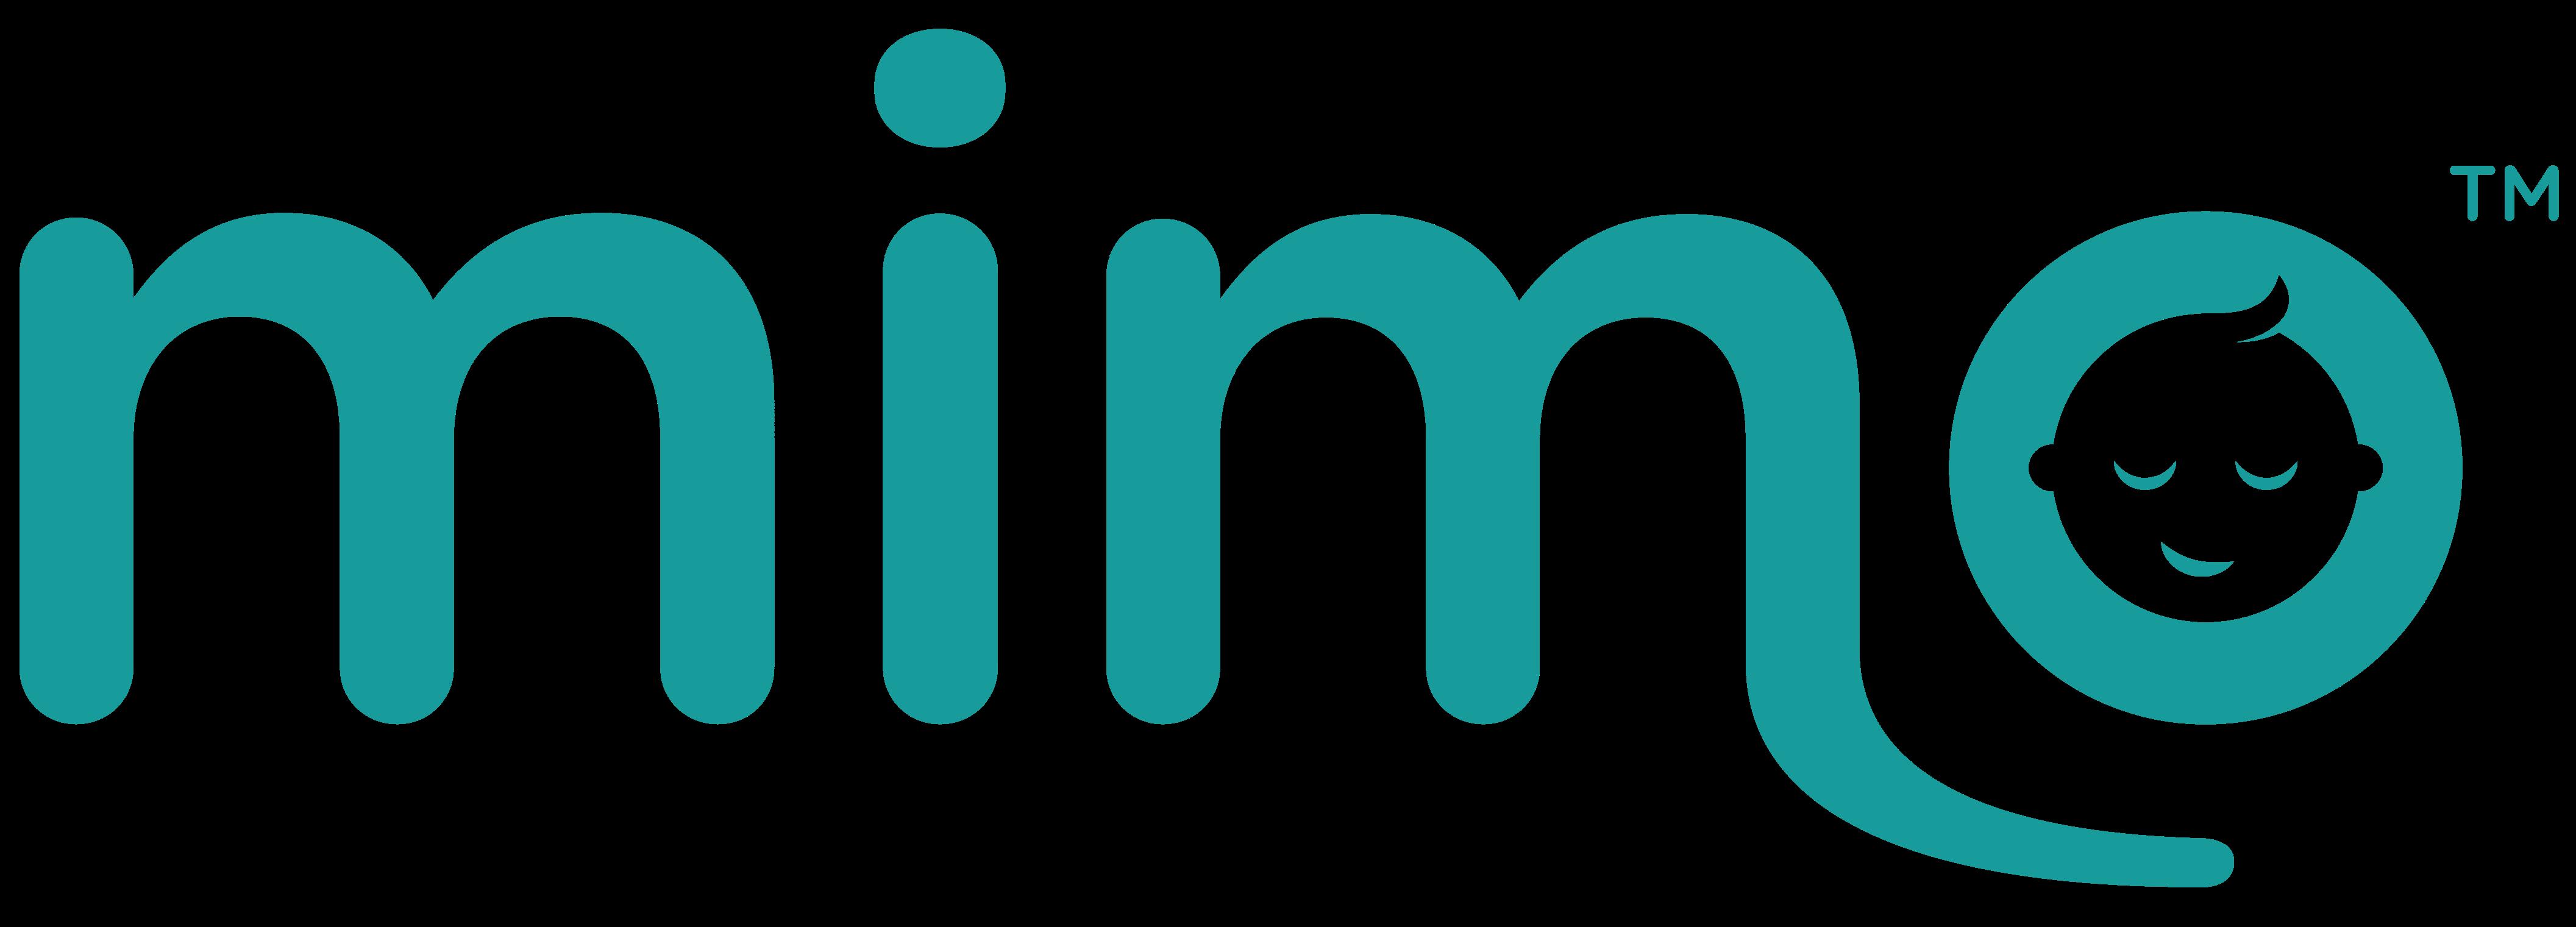 Mimo Logos Download